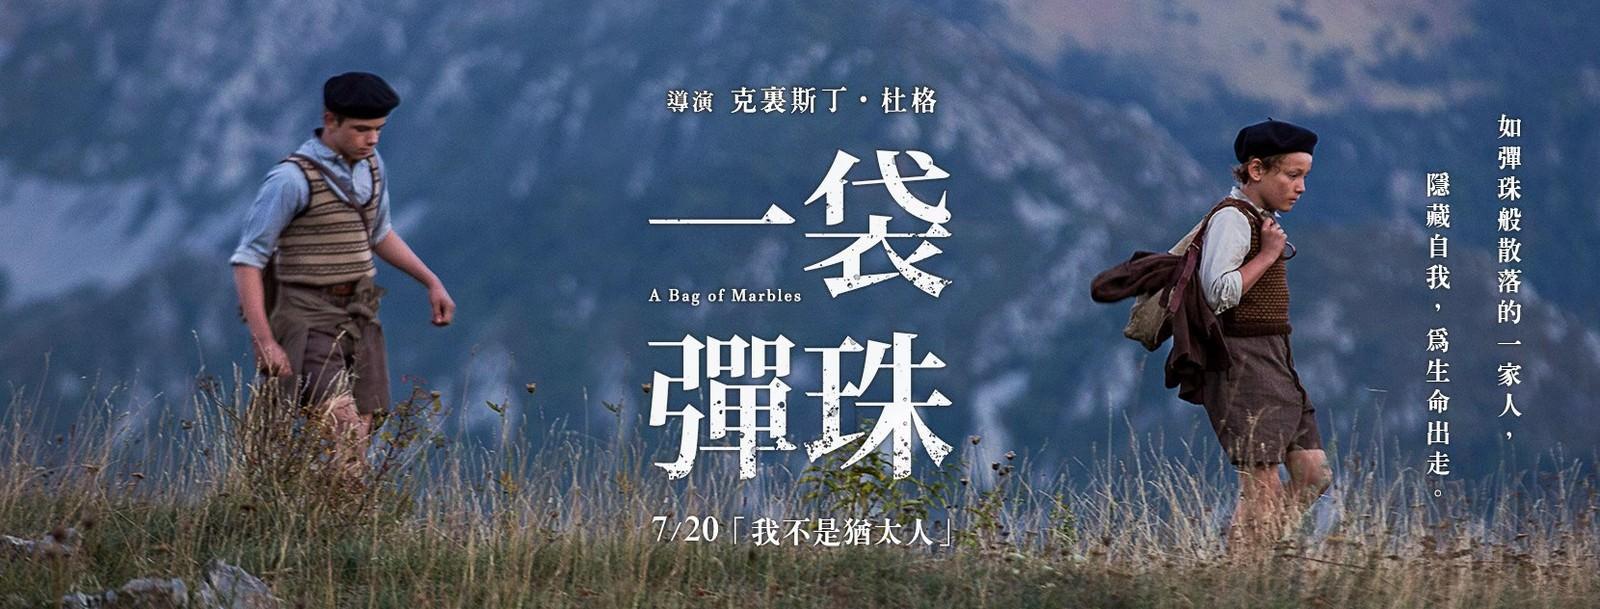 Movie, 一袋彈珠 / Un sac de billes(法國, 2017年) / A Bag Of Marbles(英文) / 一袋弹子(網路), 電影海報, 台灣